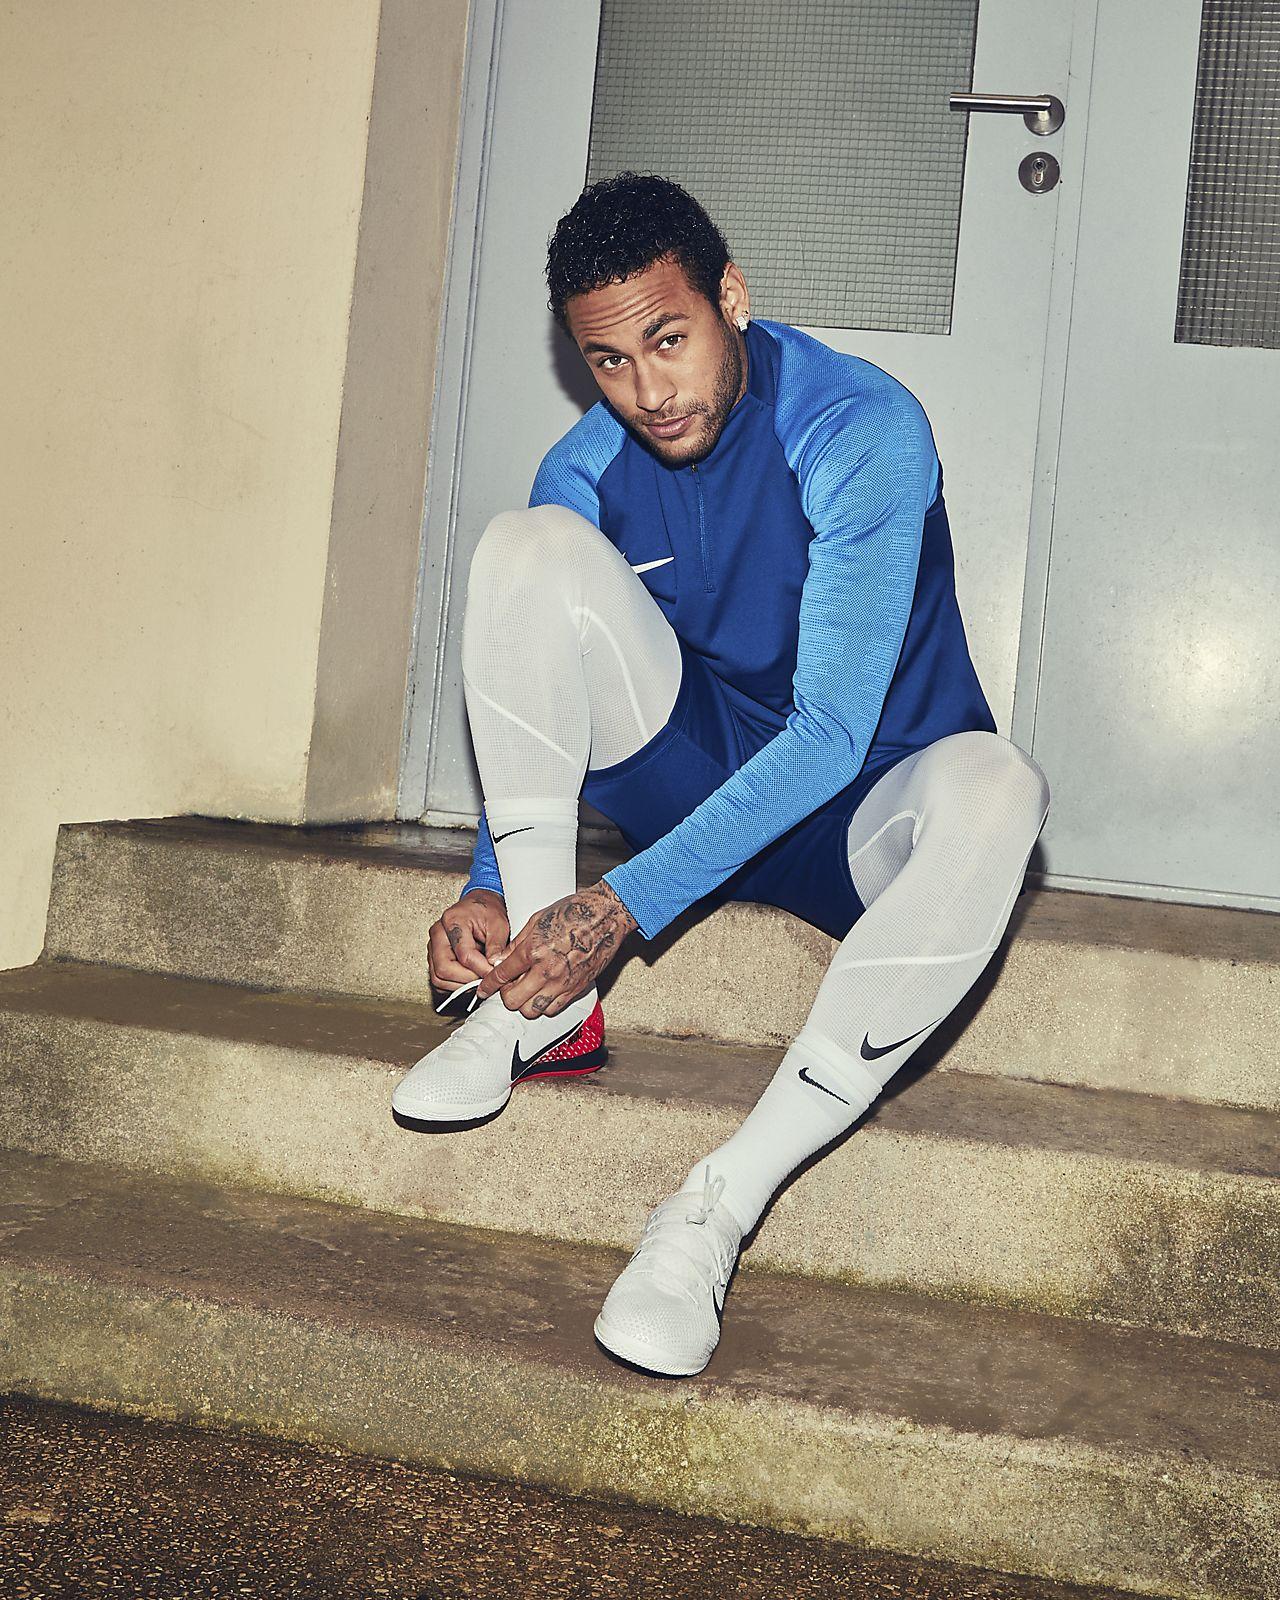 Chaussure de football en salle Nike Mercurial Vapor 13 Pro Neymar Jr. IC